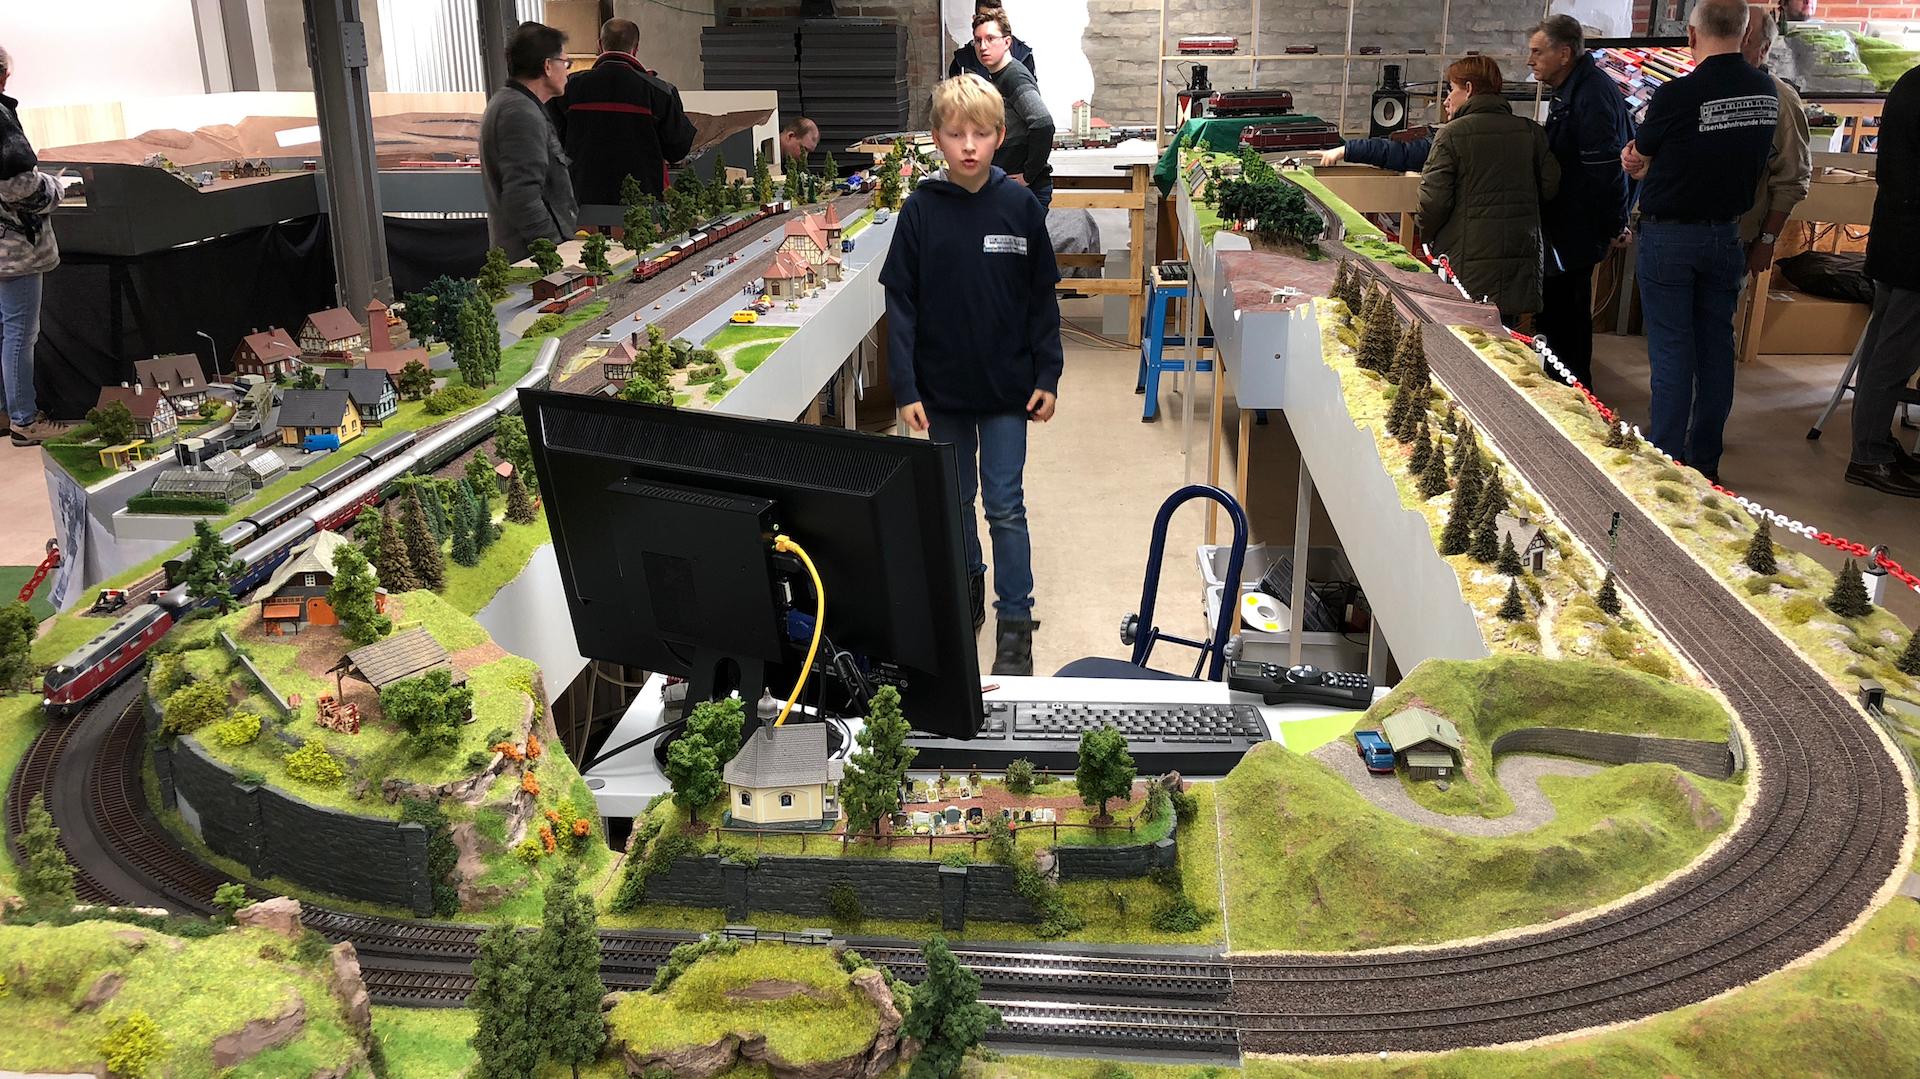 18_02_24_Schautag-Eisenbahnfreunde-Hameln_021